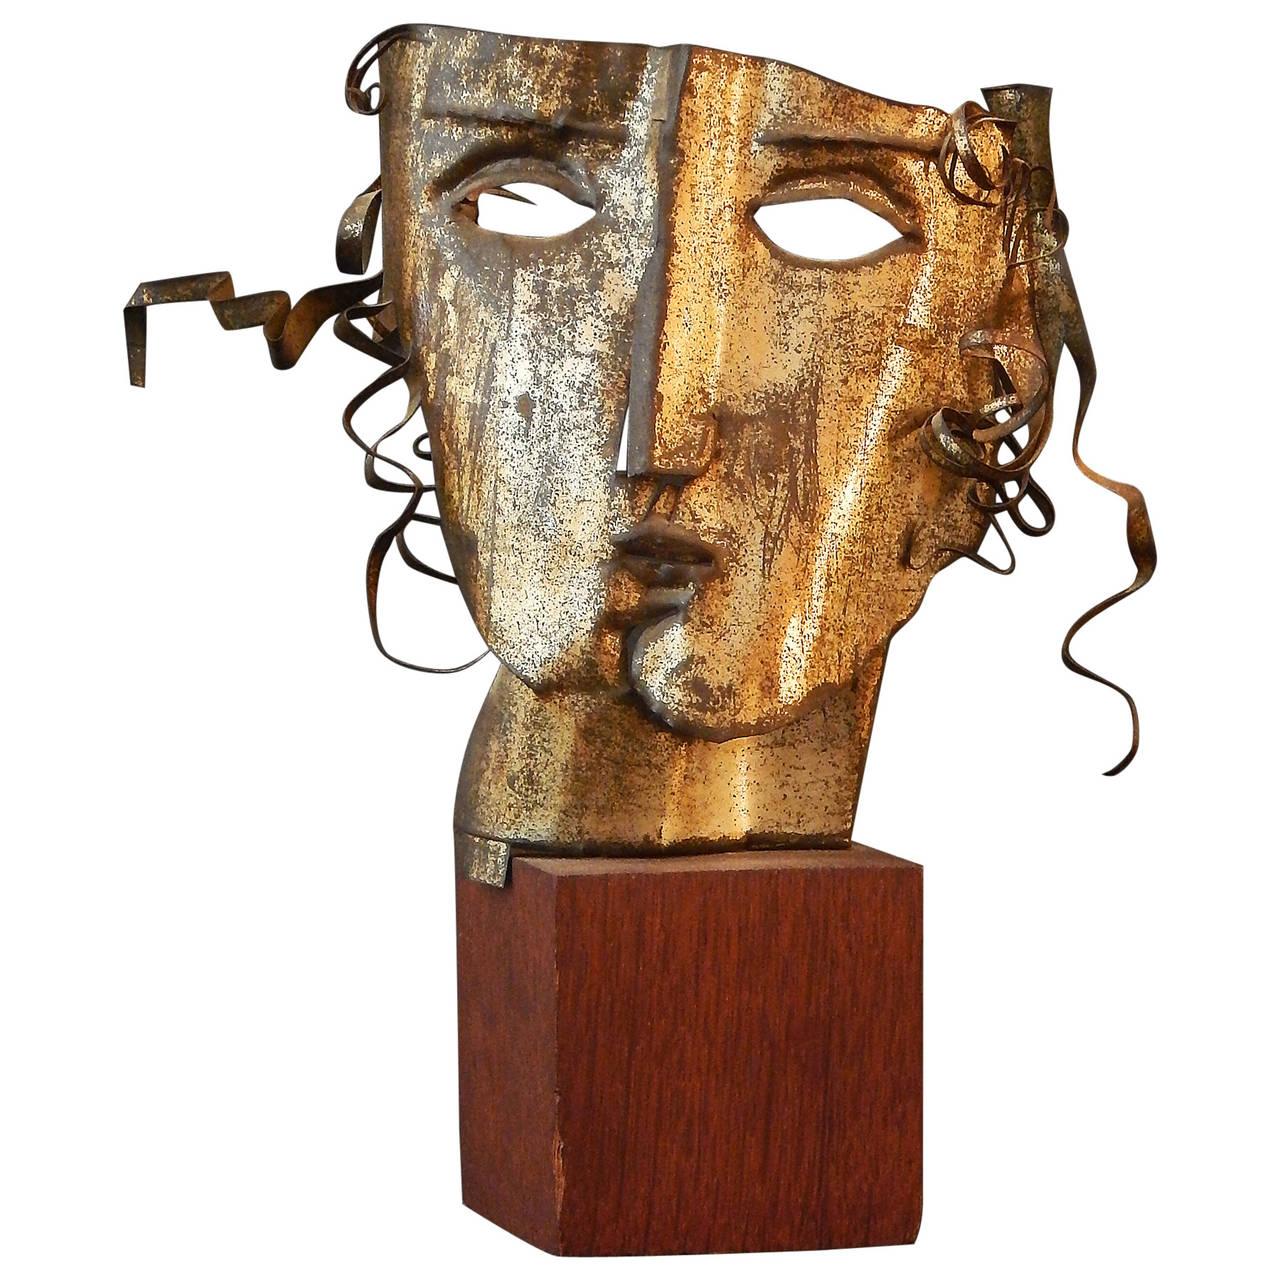 Quot Cubist Head Quot Metal Sculpture By Kinzinger 1927 At 1stdibs